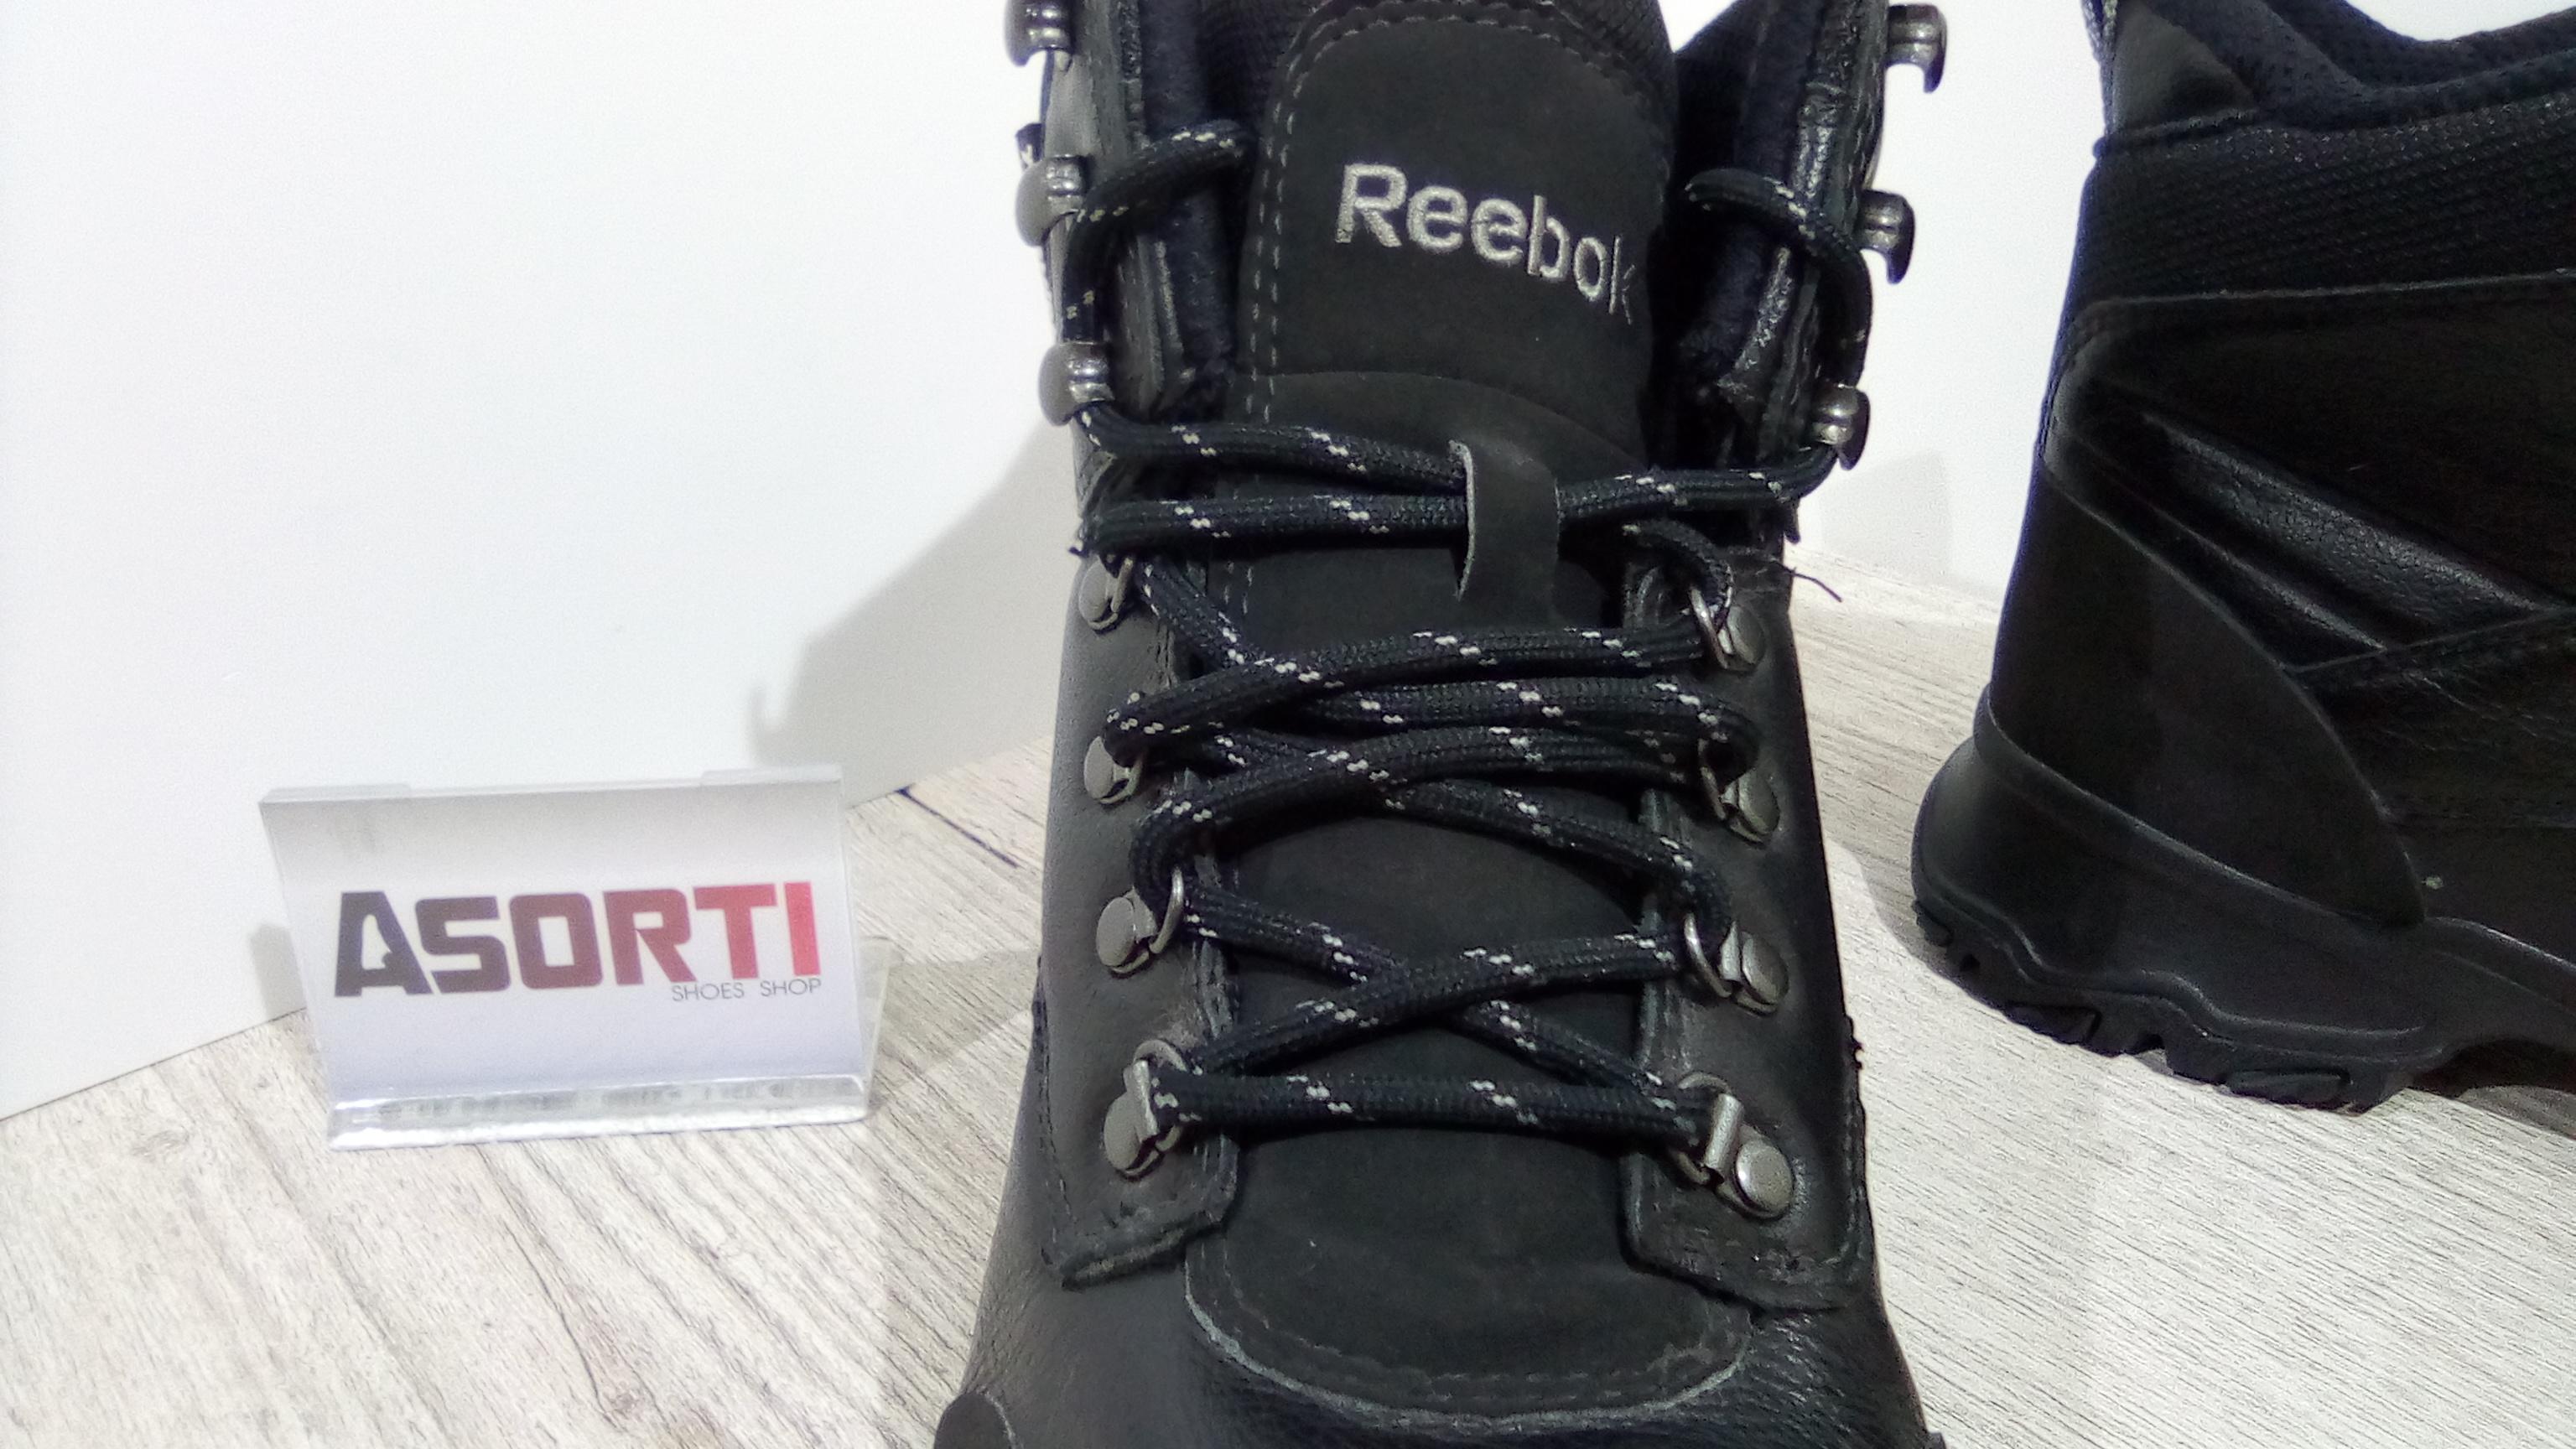 bfd66681 ... Мужские утепленные ботинки Reebok Crestview TR II (J16890) черные